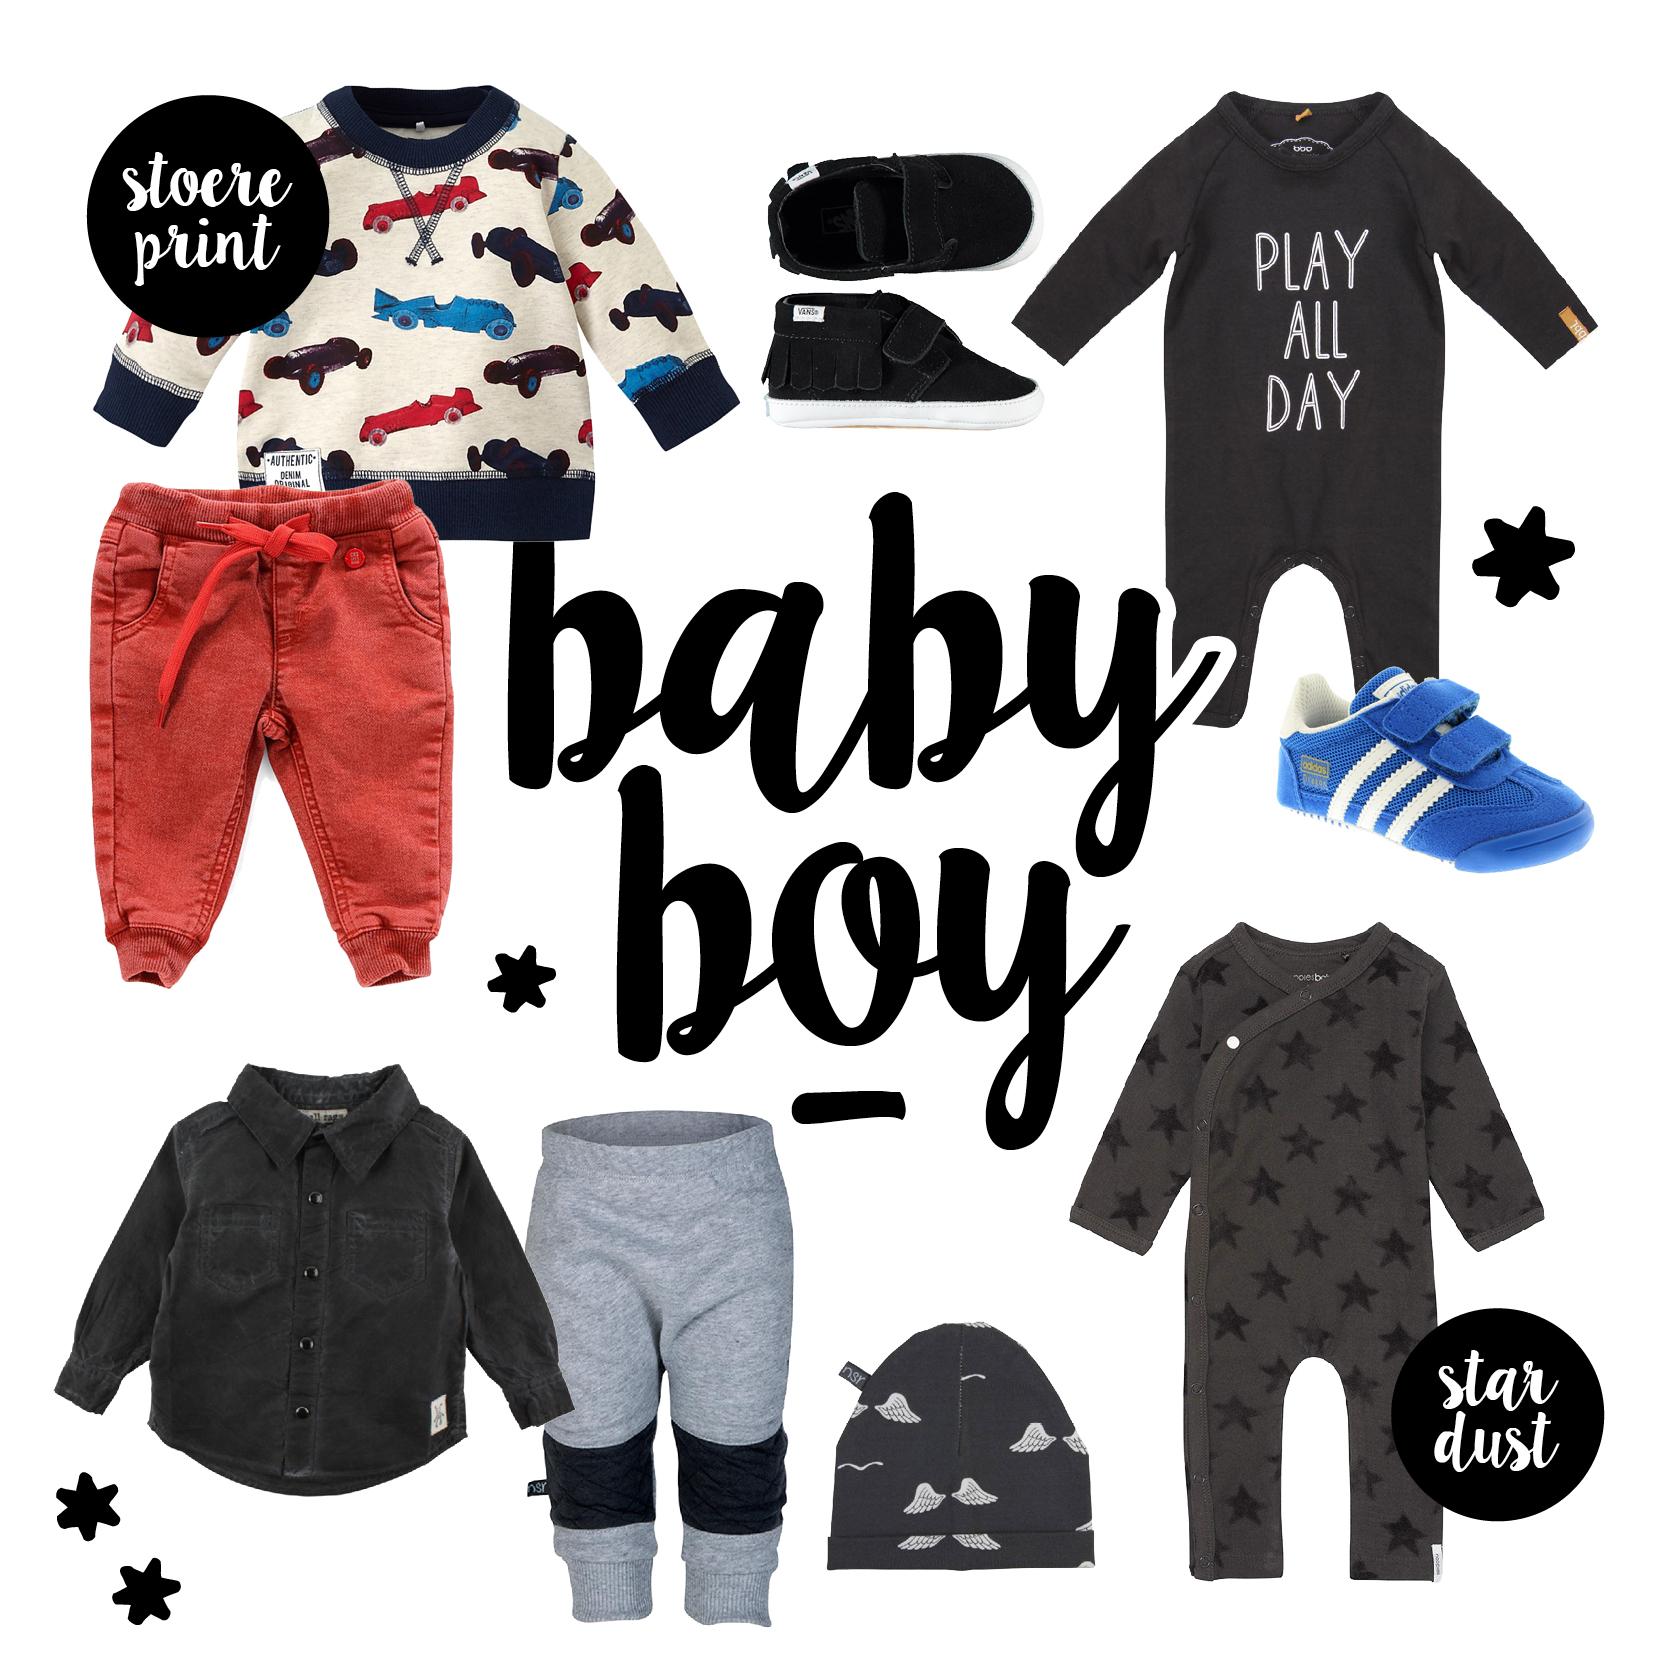 baby boy, jongens babykleding, hippe babykleding, babykleding styling, tips